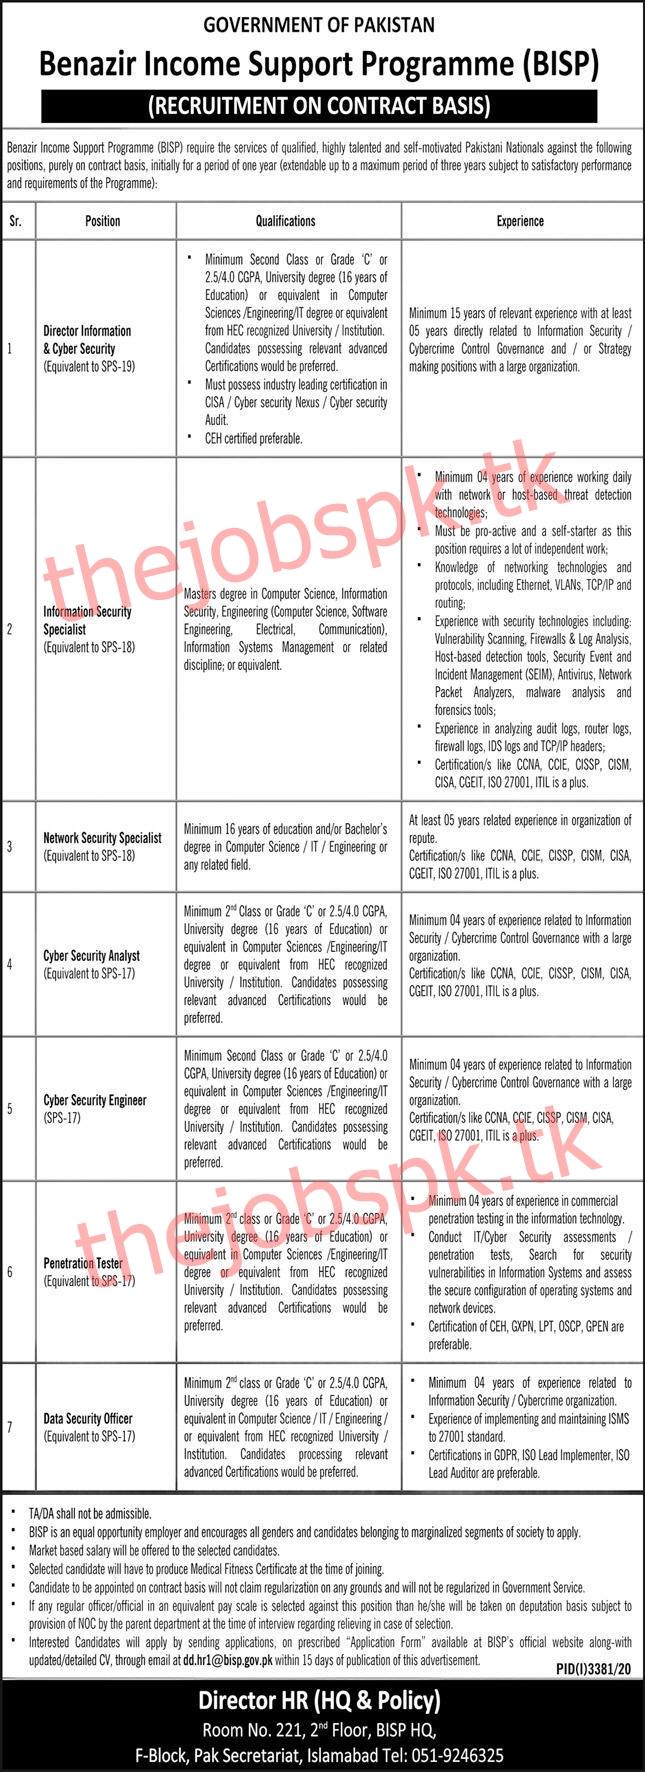 Latest Benazir Income Support Programme BISP Management Posts 2021